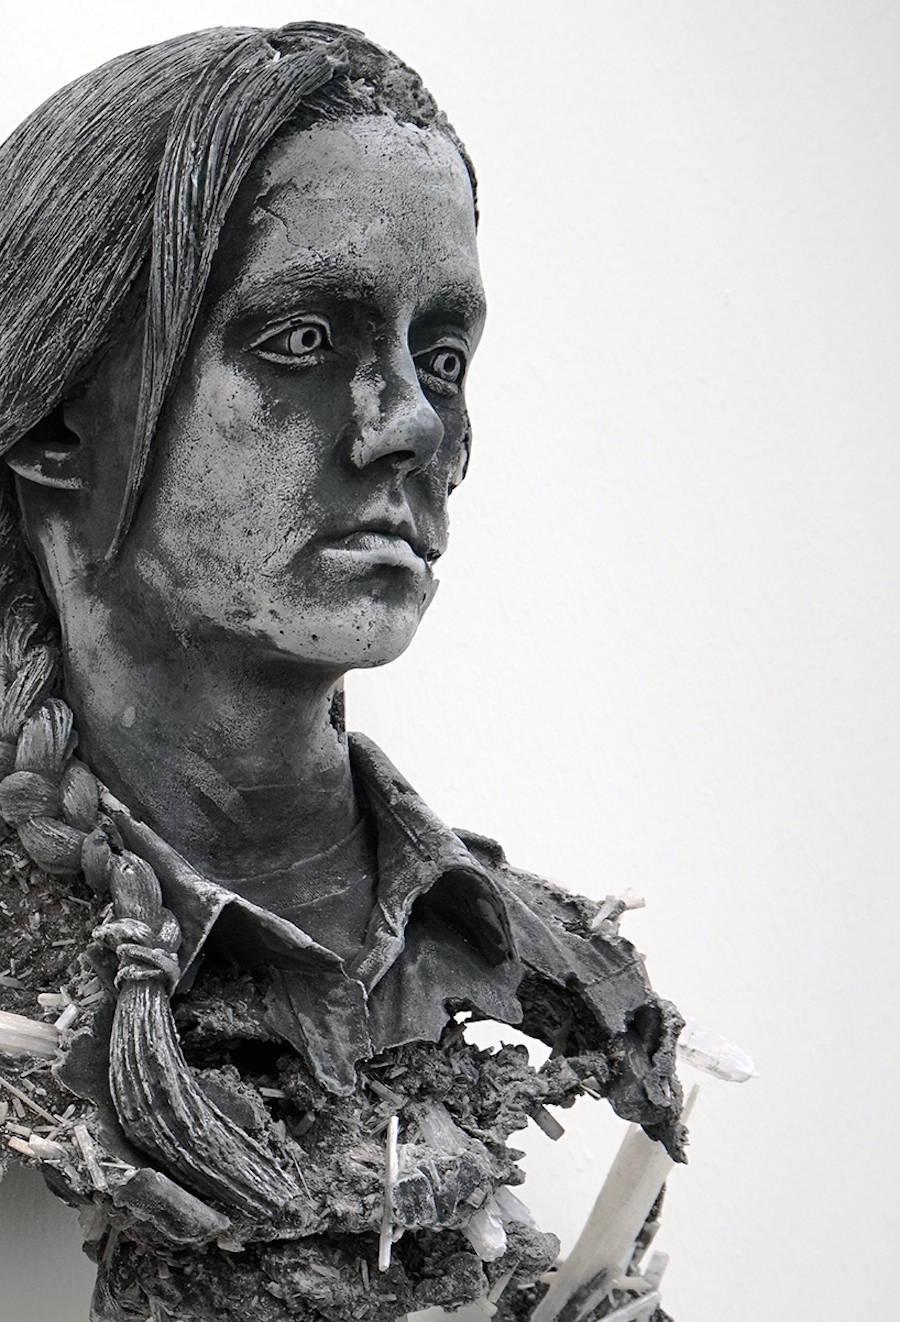 scultura-donna-cenere-vulcanica-selenite-daniel-arsham-08